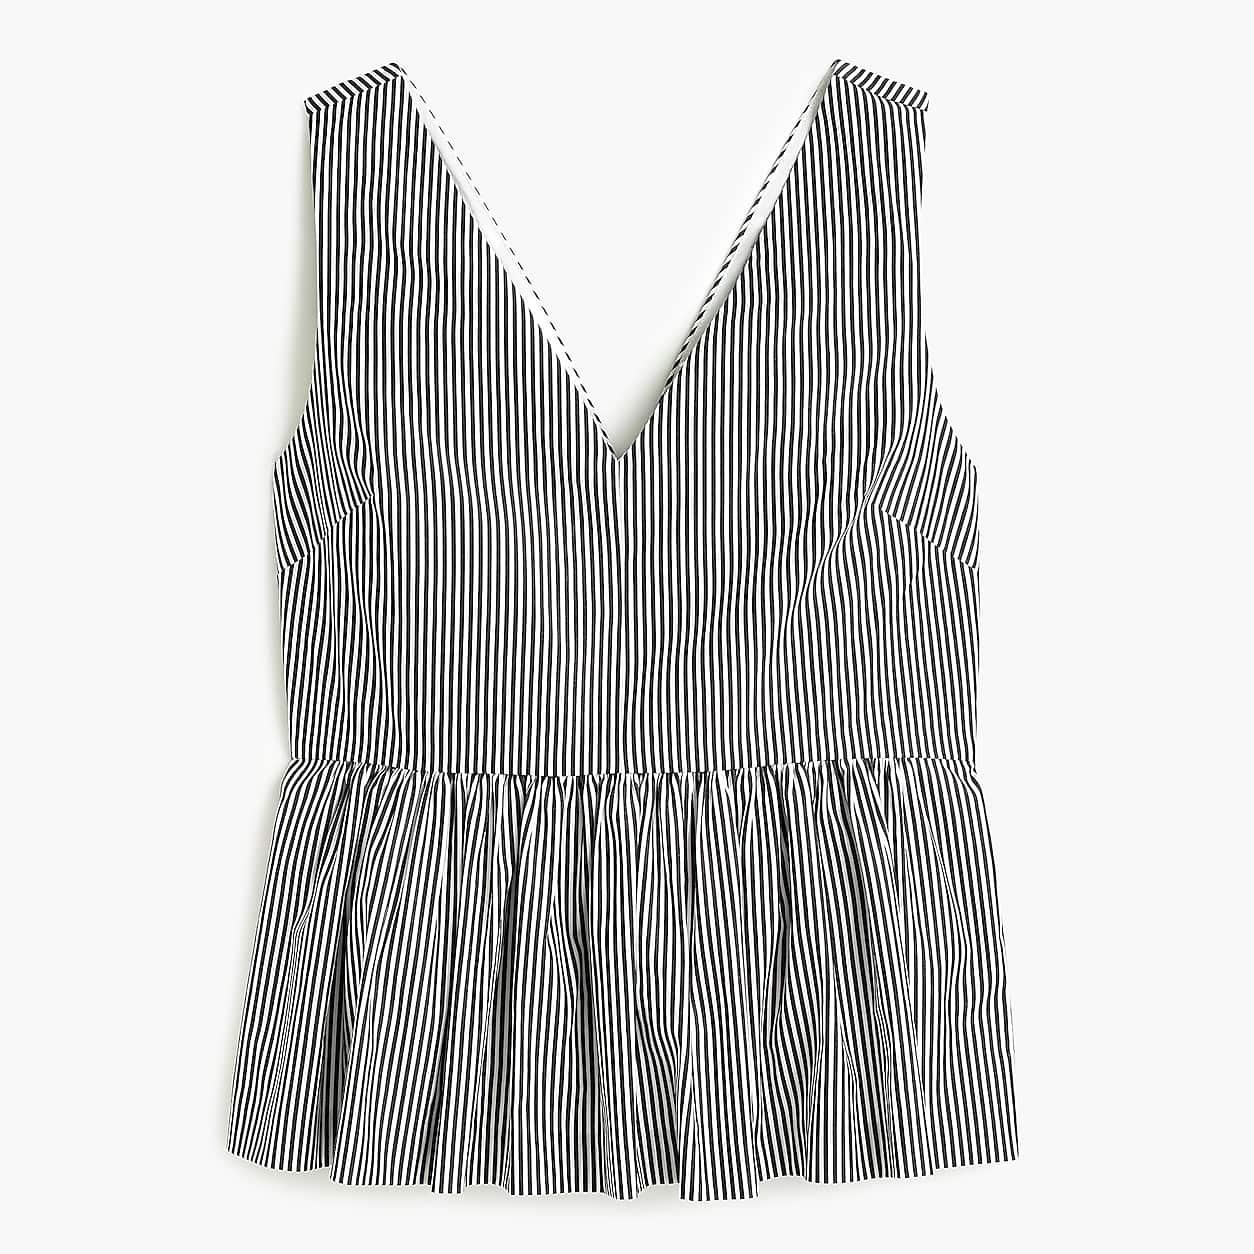 cbaa454ecc237 Petite Striped Sleeveless Peplum Top In Stretch Cotton Poplin ...